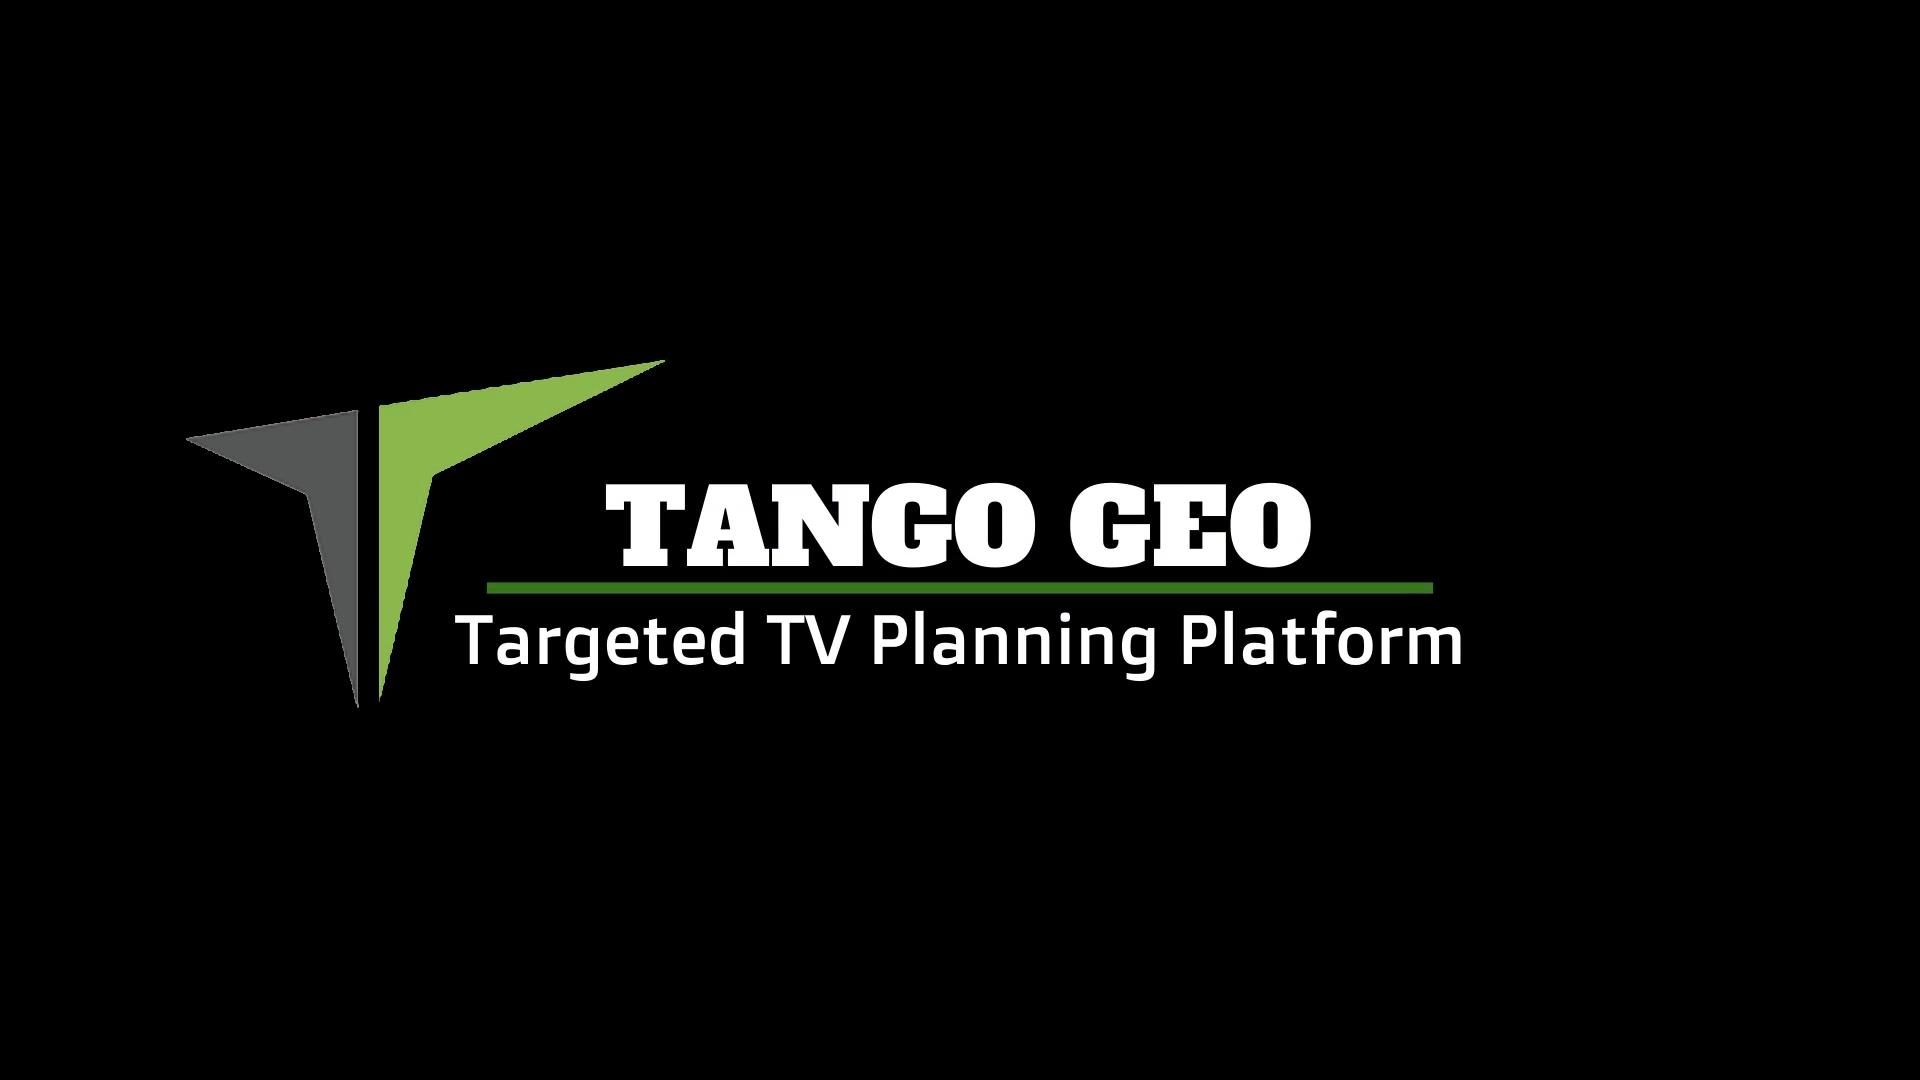 NAB TangoGEO Promo 60sec